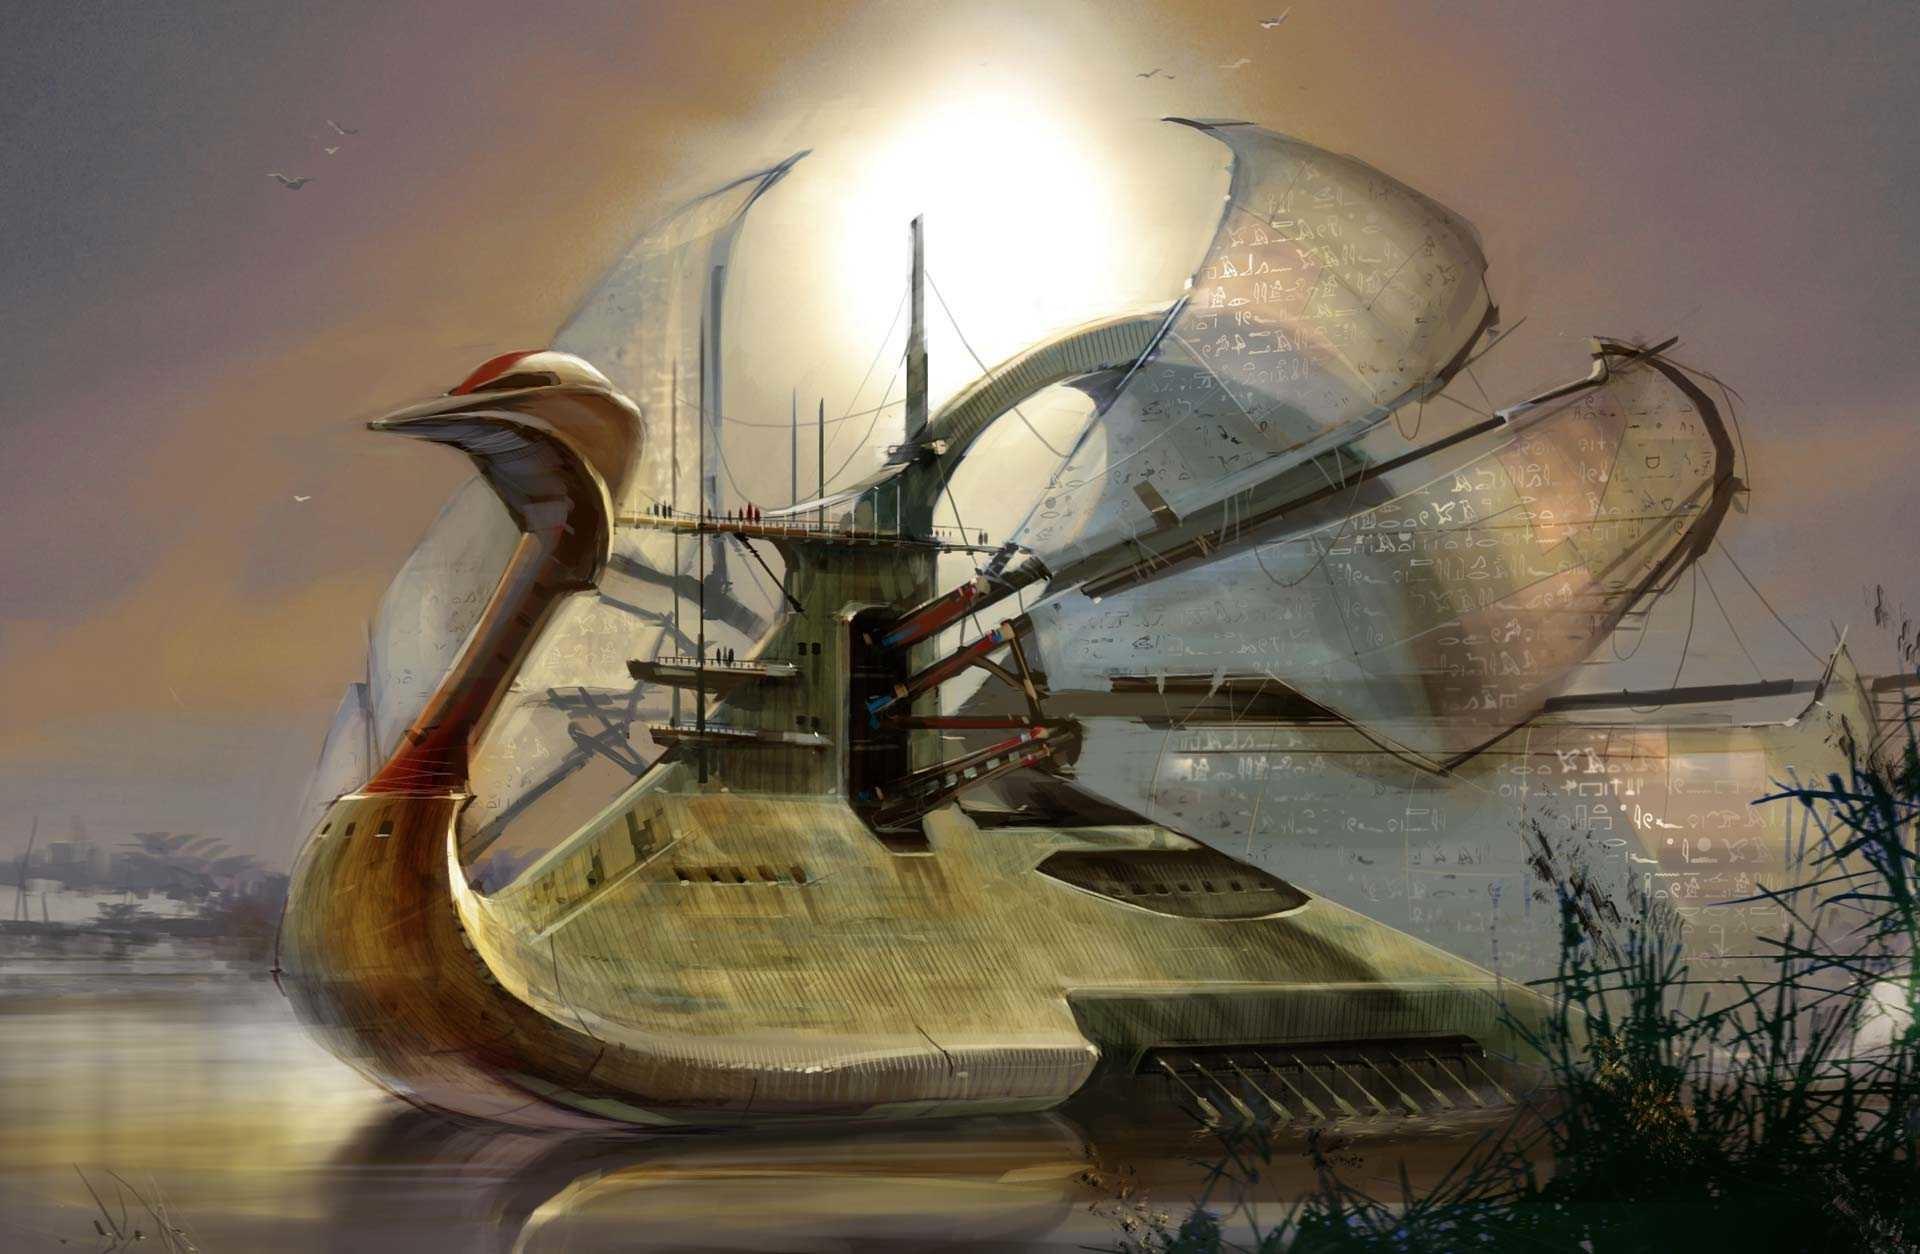 Old Model Ship Wallpaper 1920×1254 https://nirhara.com/category